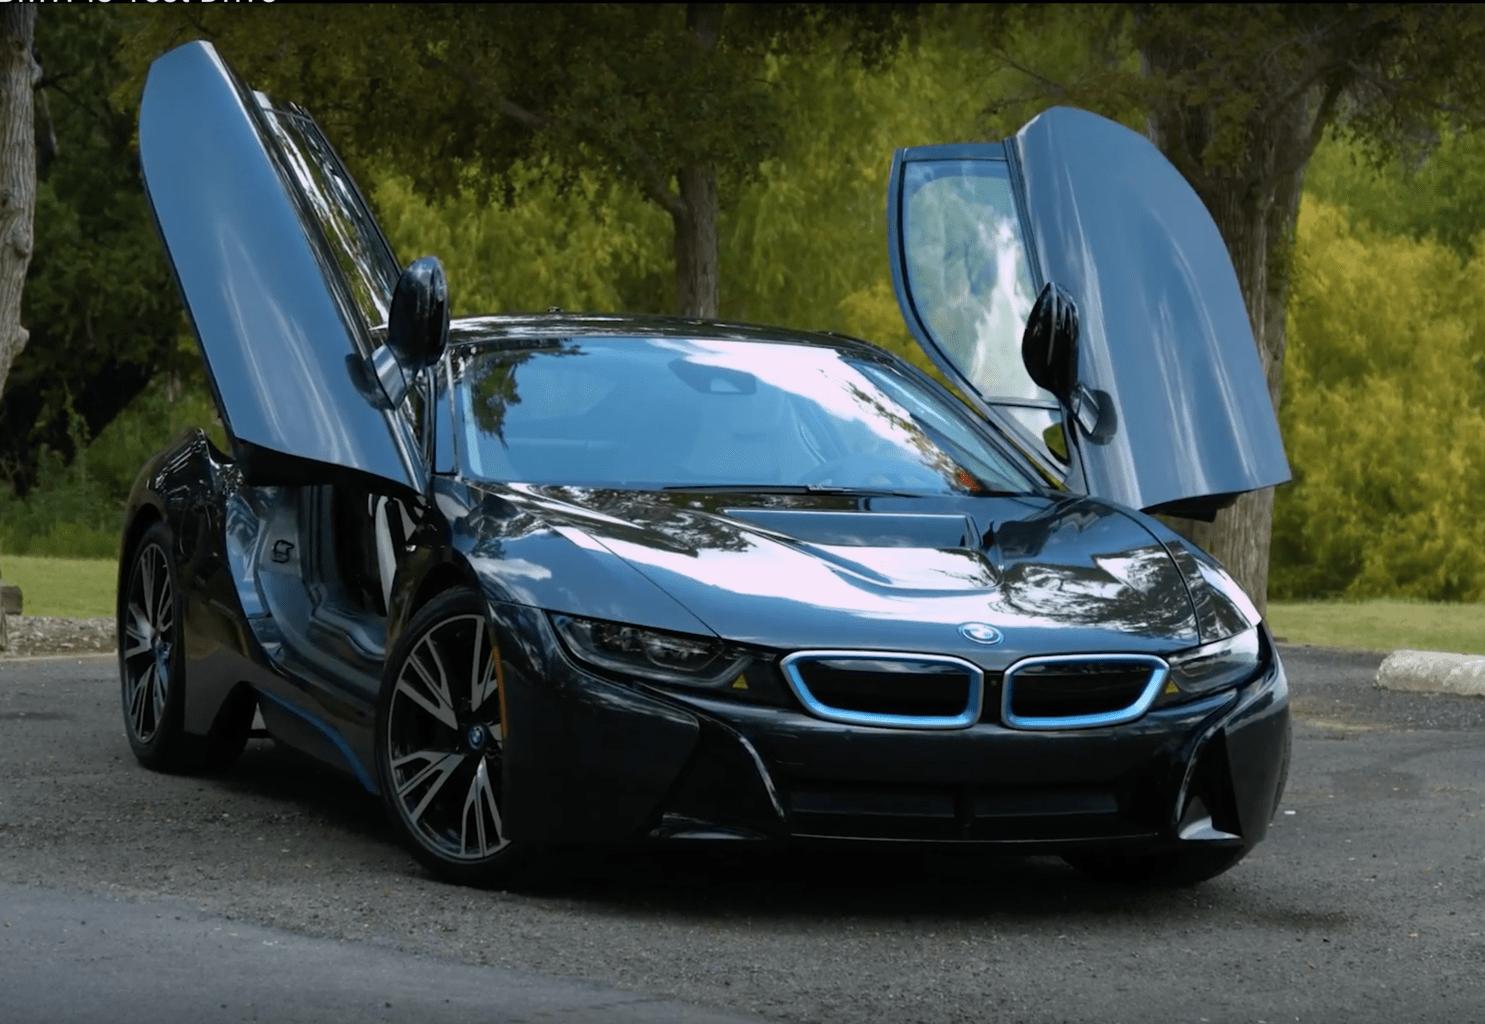 2017 BMW i8 Test Drive Photo Gallery